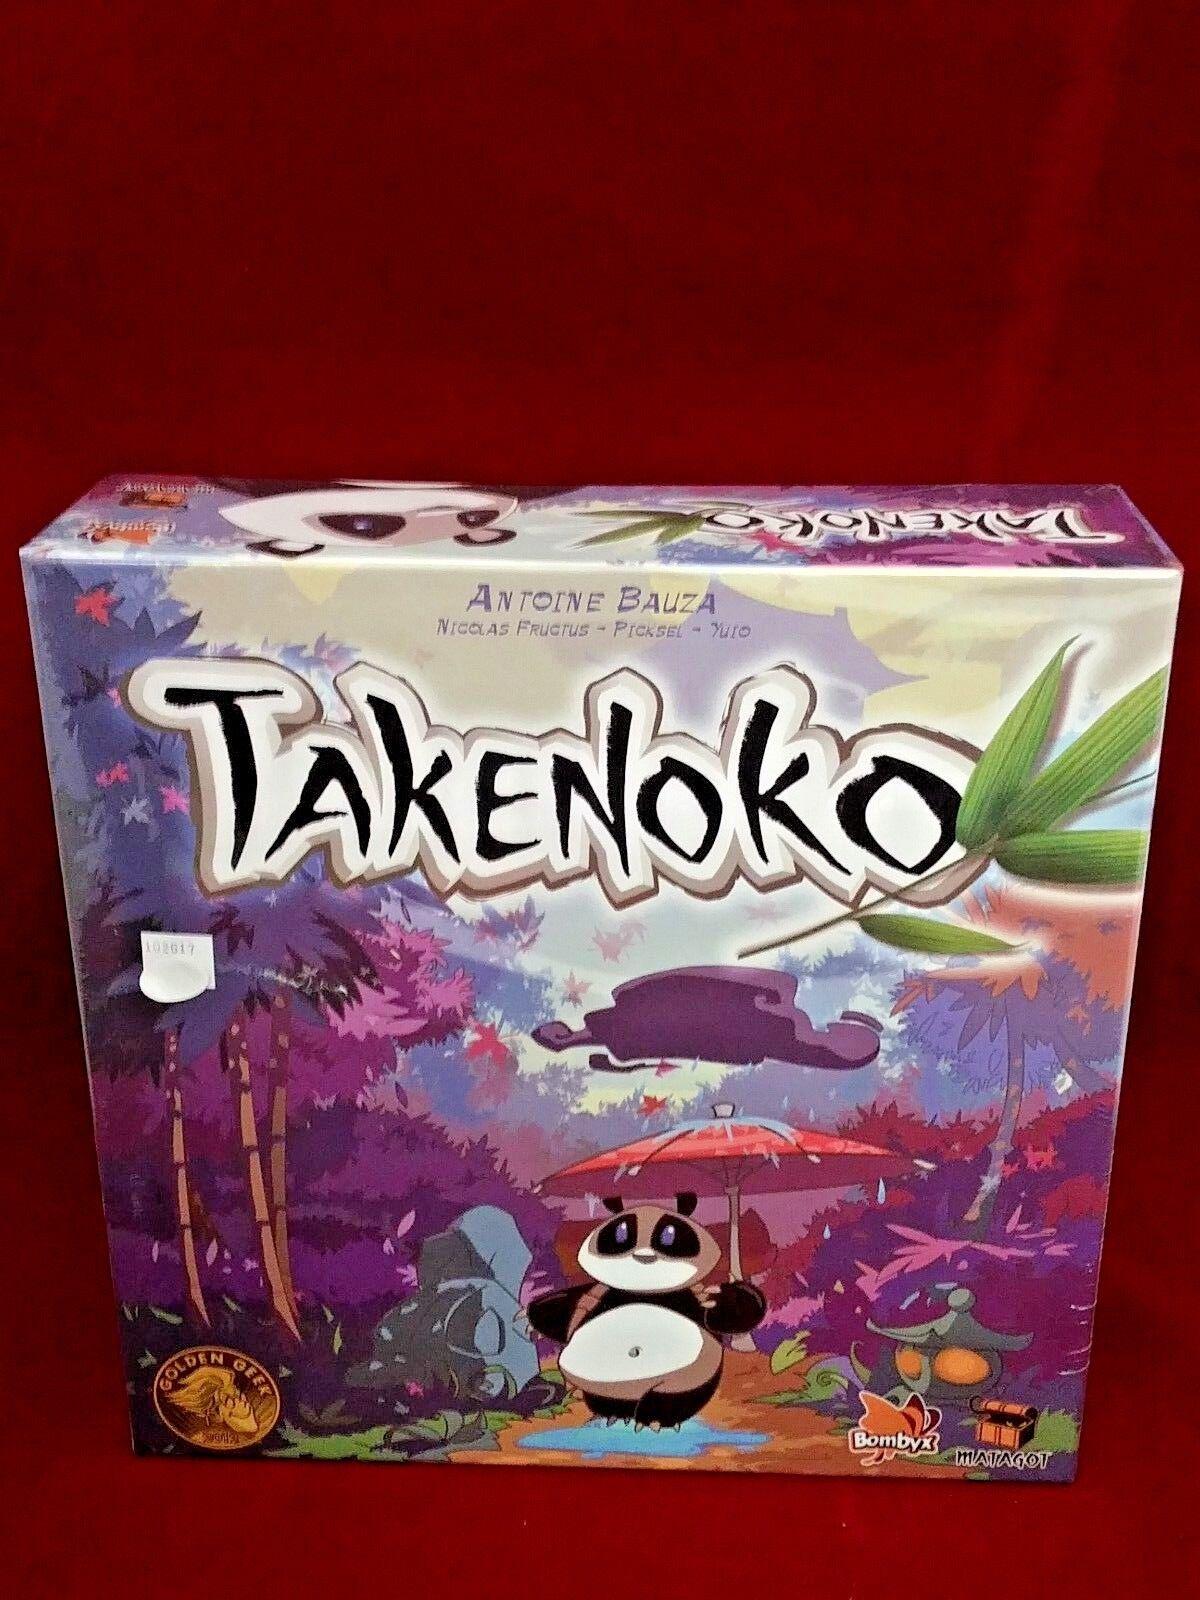 Takenoko panda strategie spiel, neue fabrik versiegelt asmodee matagot bombyx